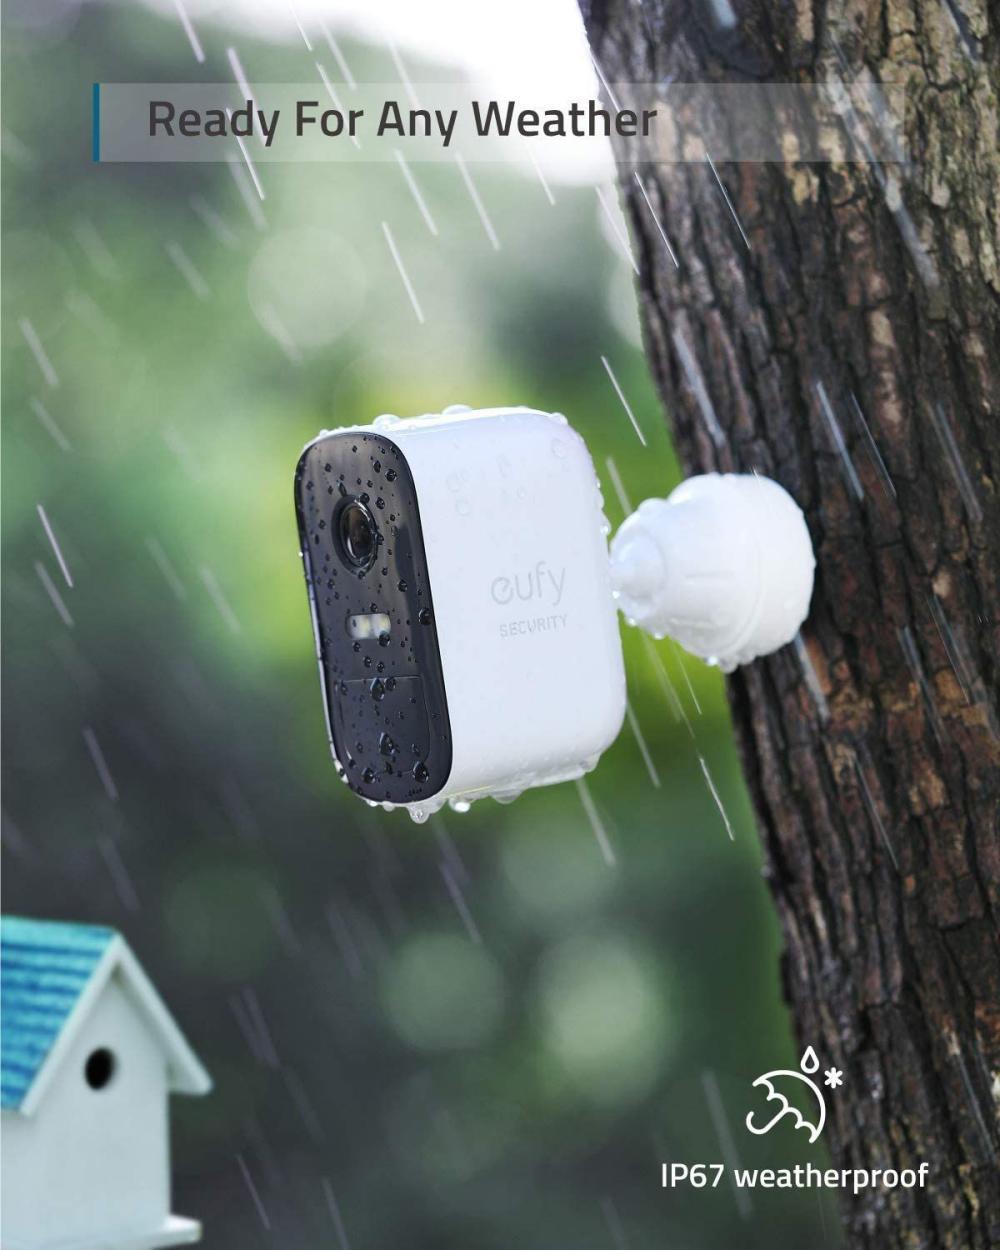 Eufy Eufycam 2c Wireless Home Security Camera System 1080p (2)